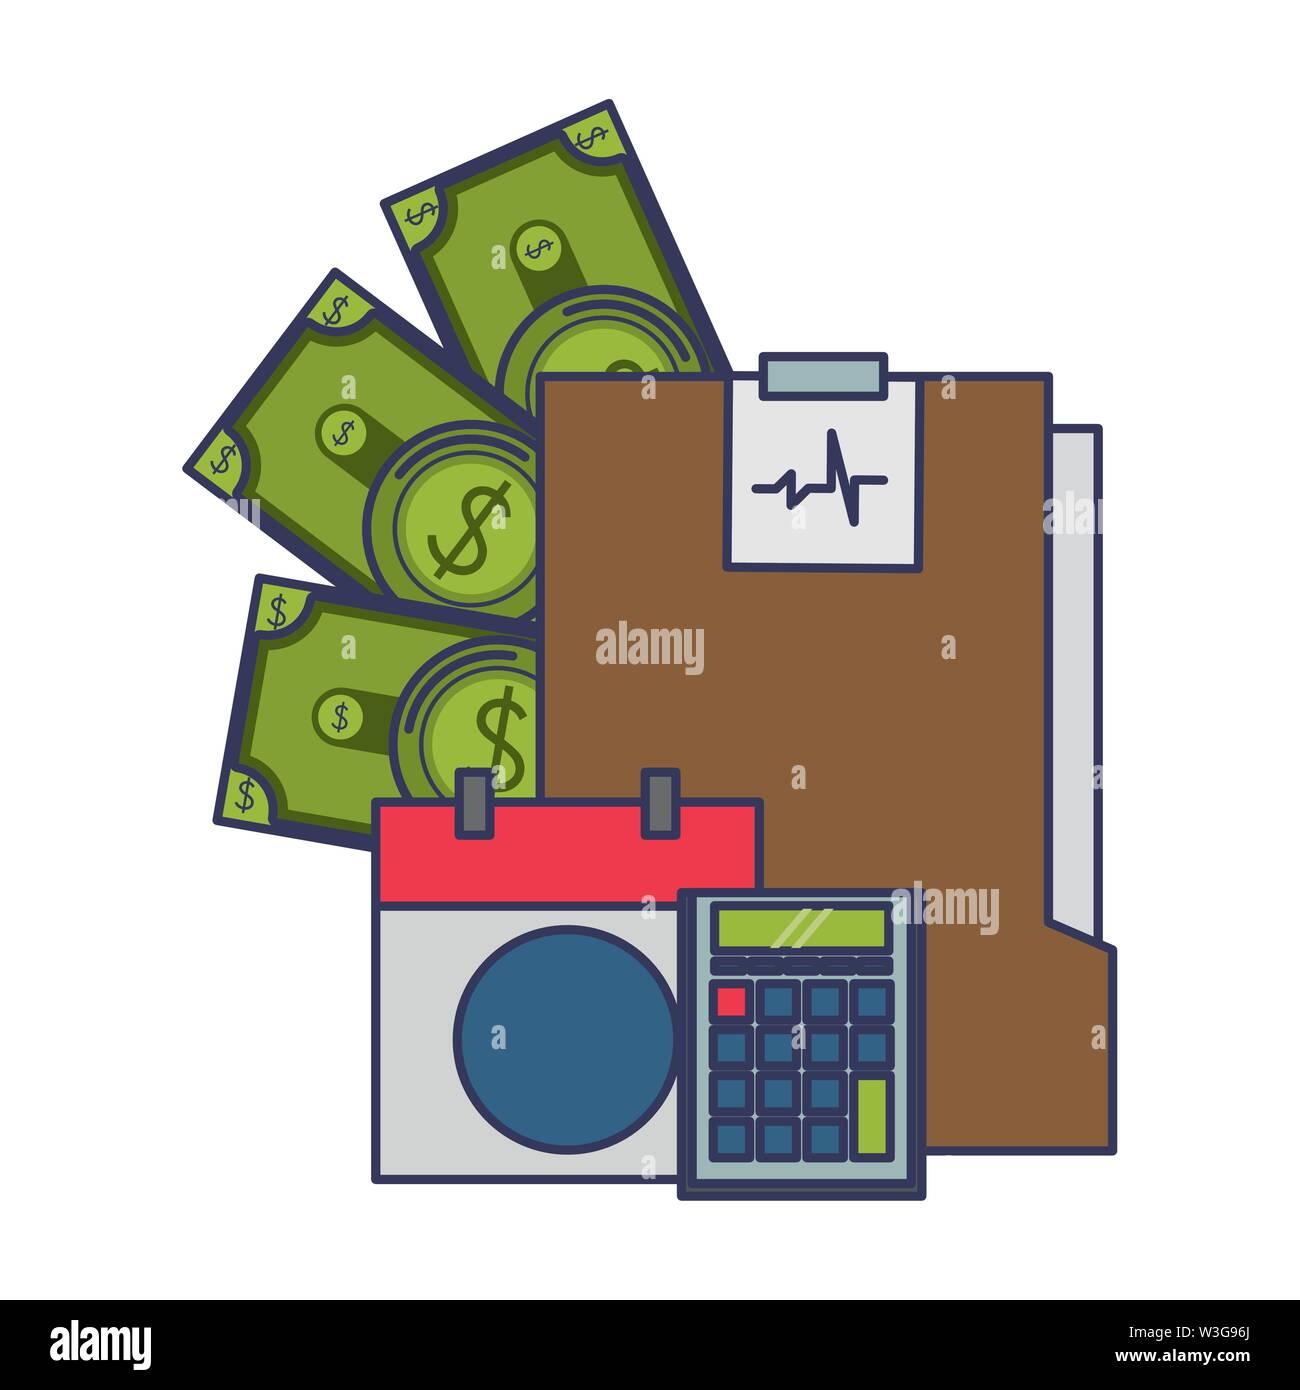 Geld sparen Finanzen Cartoon Stockbild